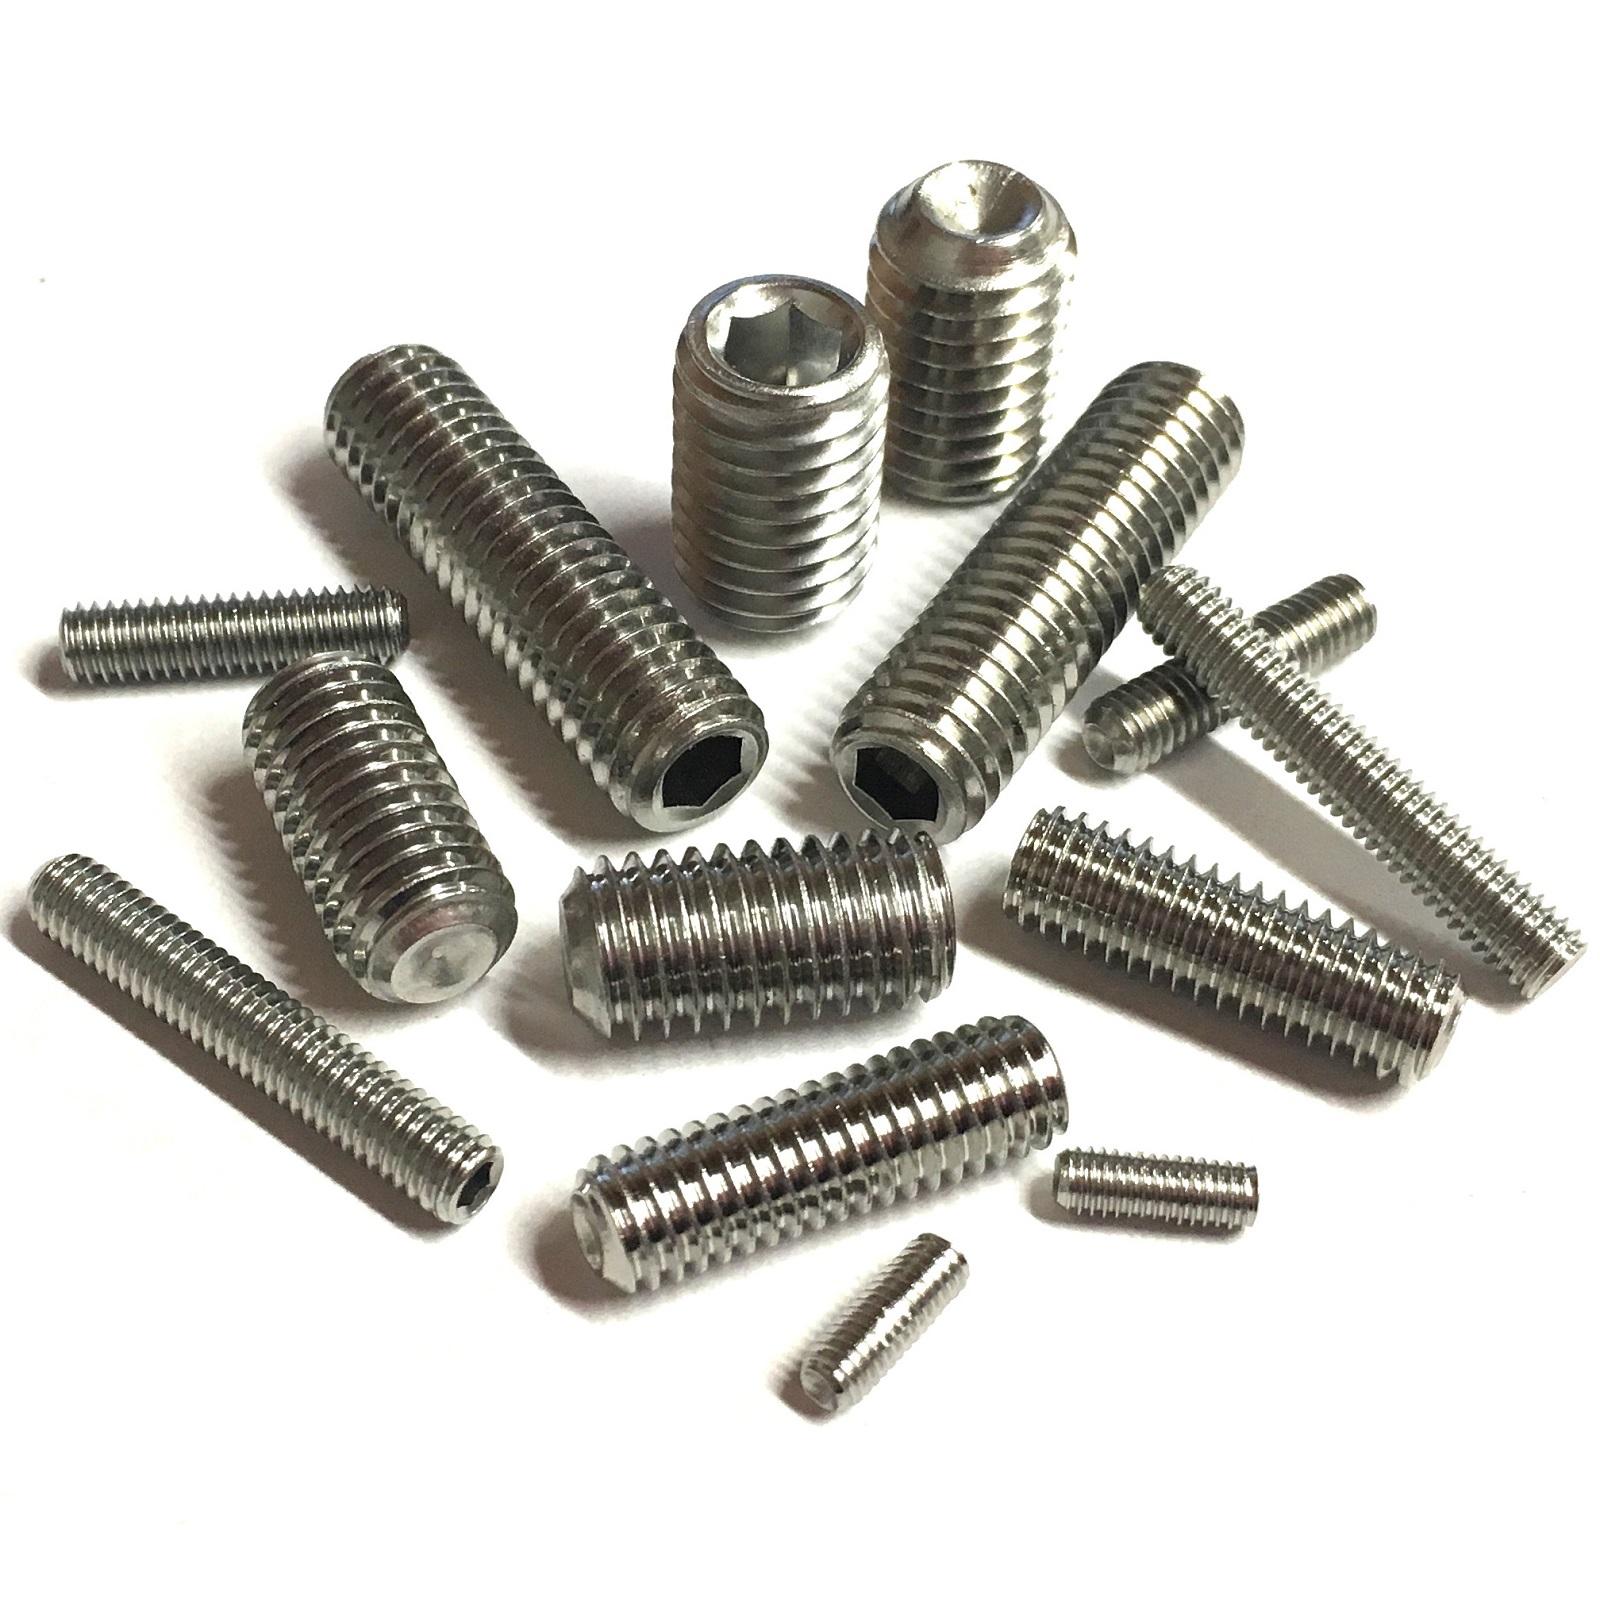 A2 Stainless Steel Setscrews DIN 916 4mm 5mm 6mm Socket Cup Point Grub Screws